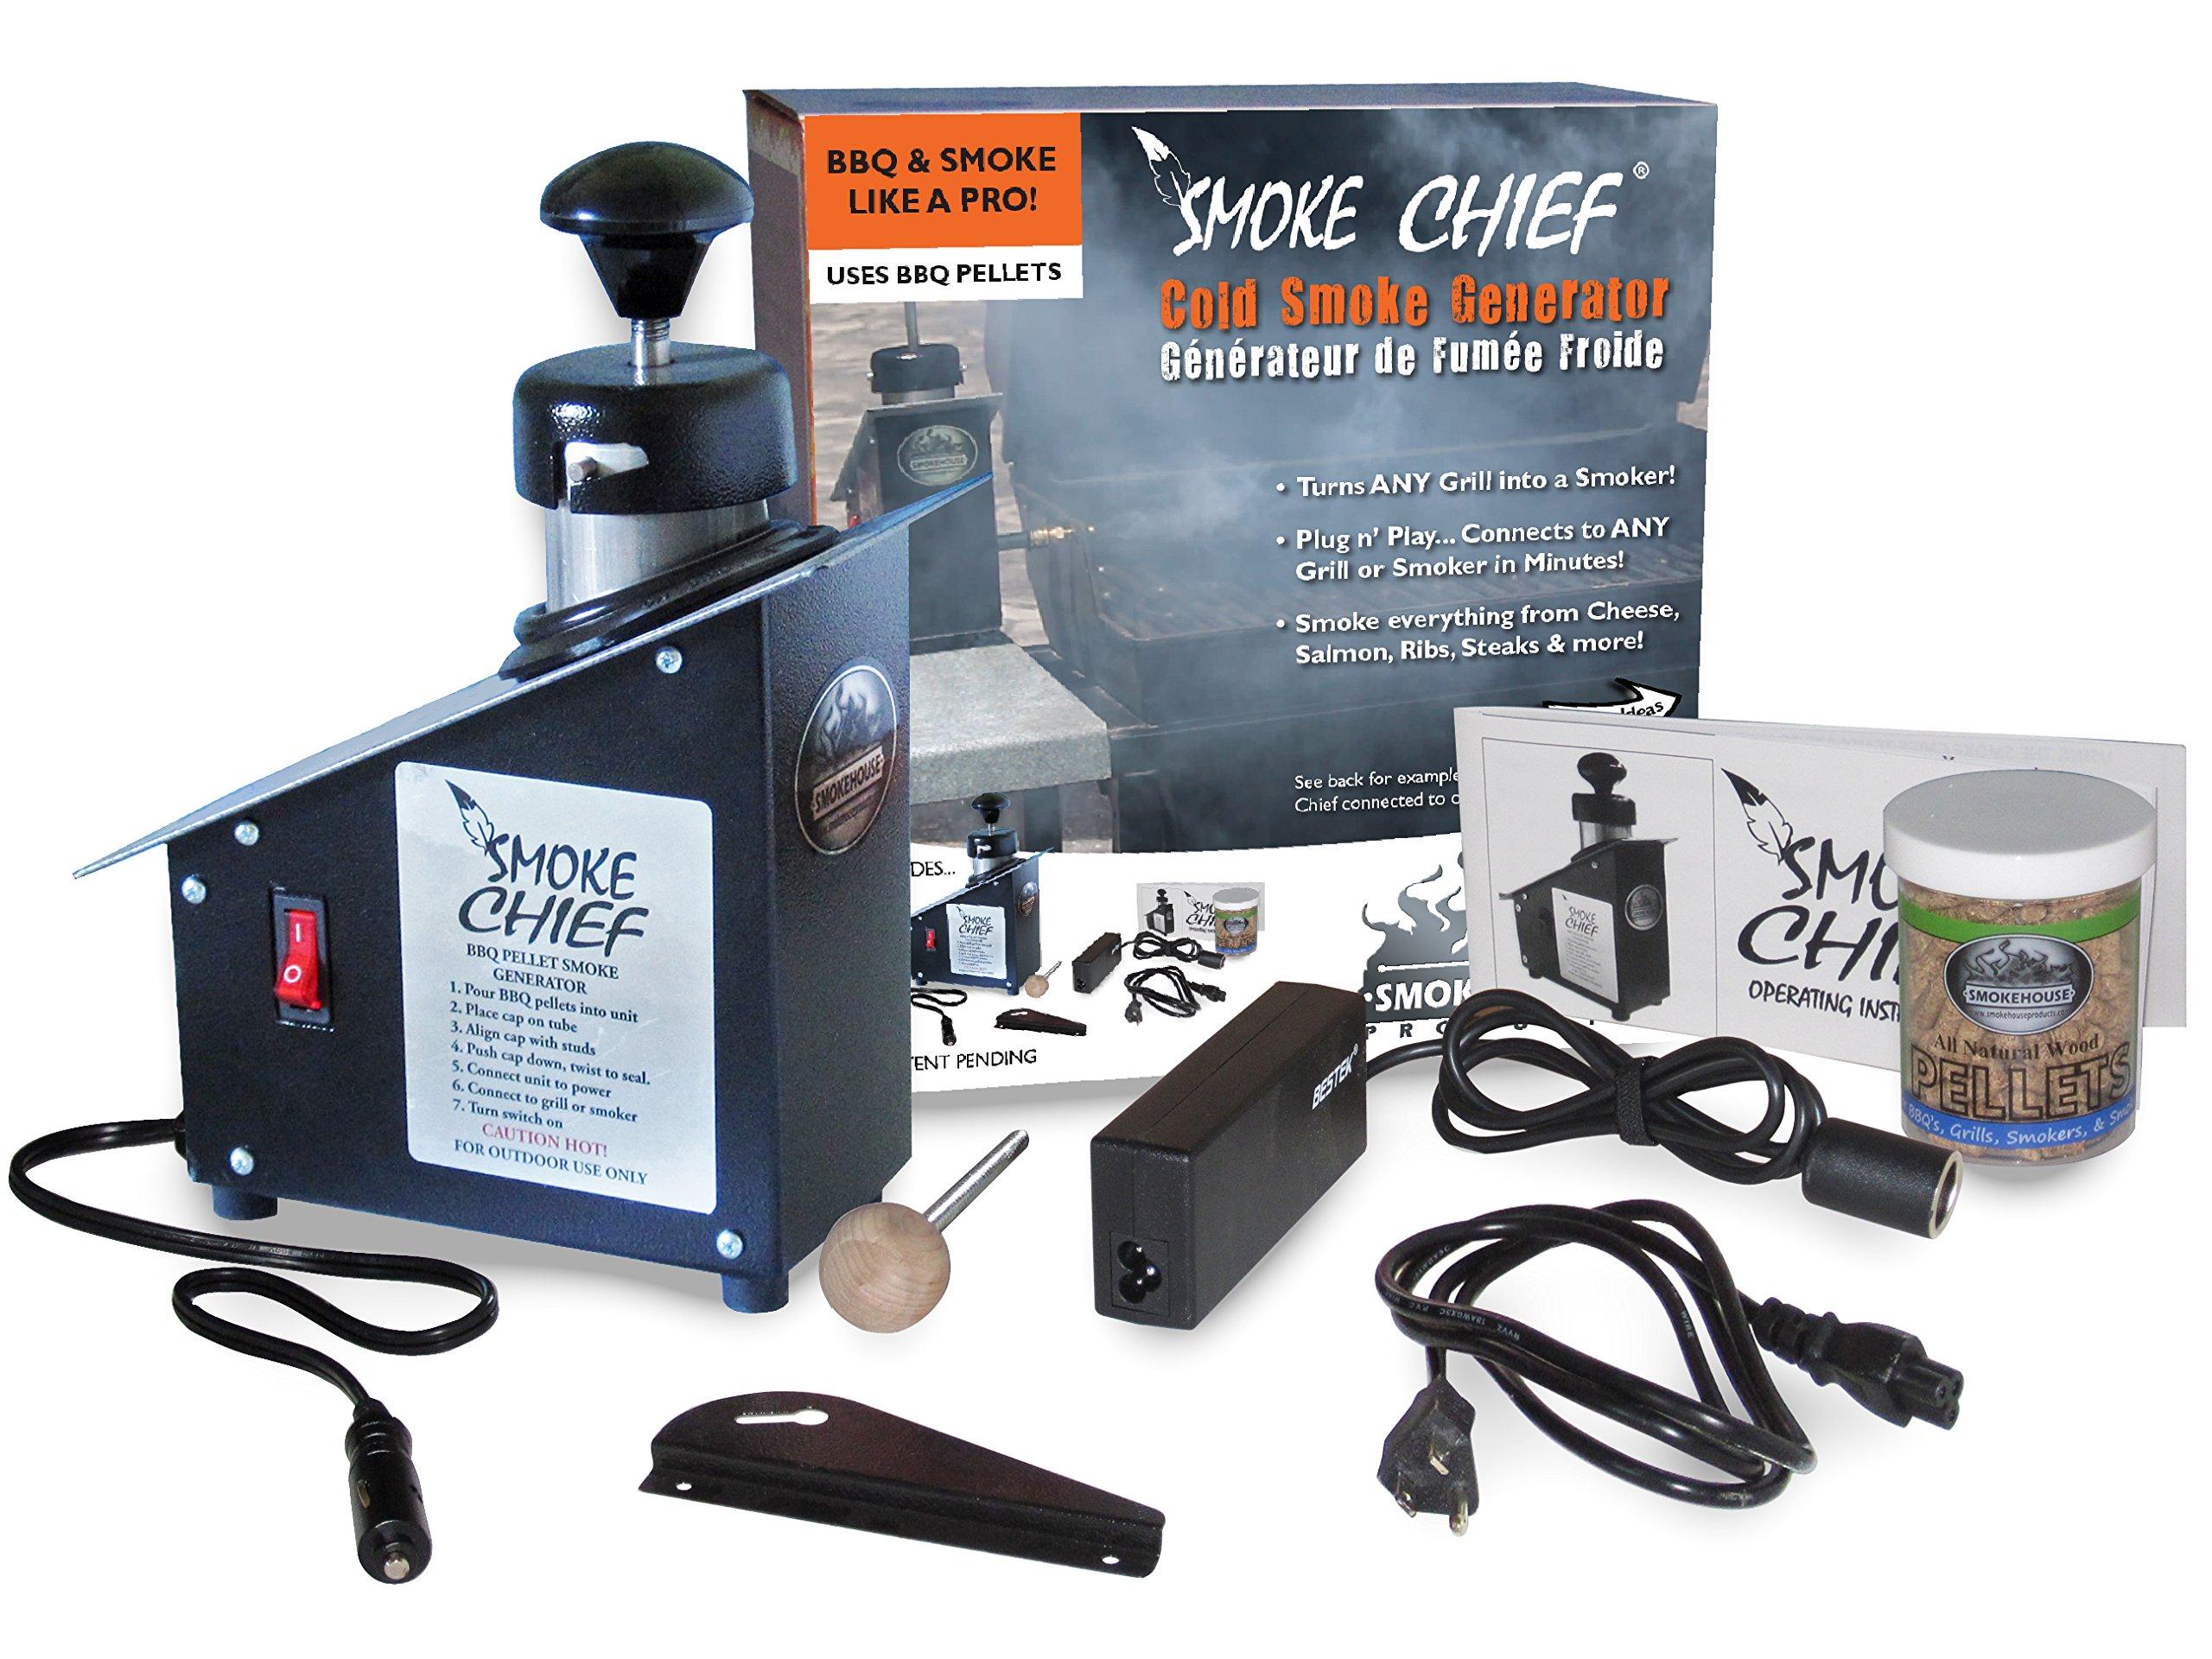 Smokehouse Products 9500-000-0000 Smoke Chief Cold Smoke Generator by SmokeHouse (Image #1)